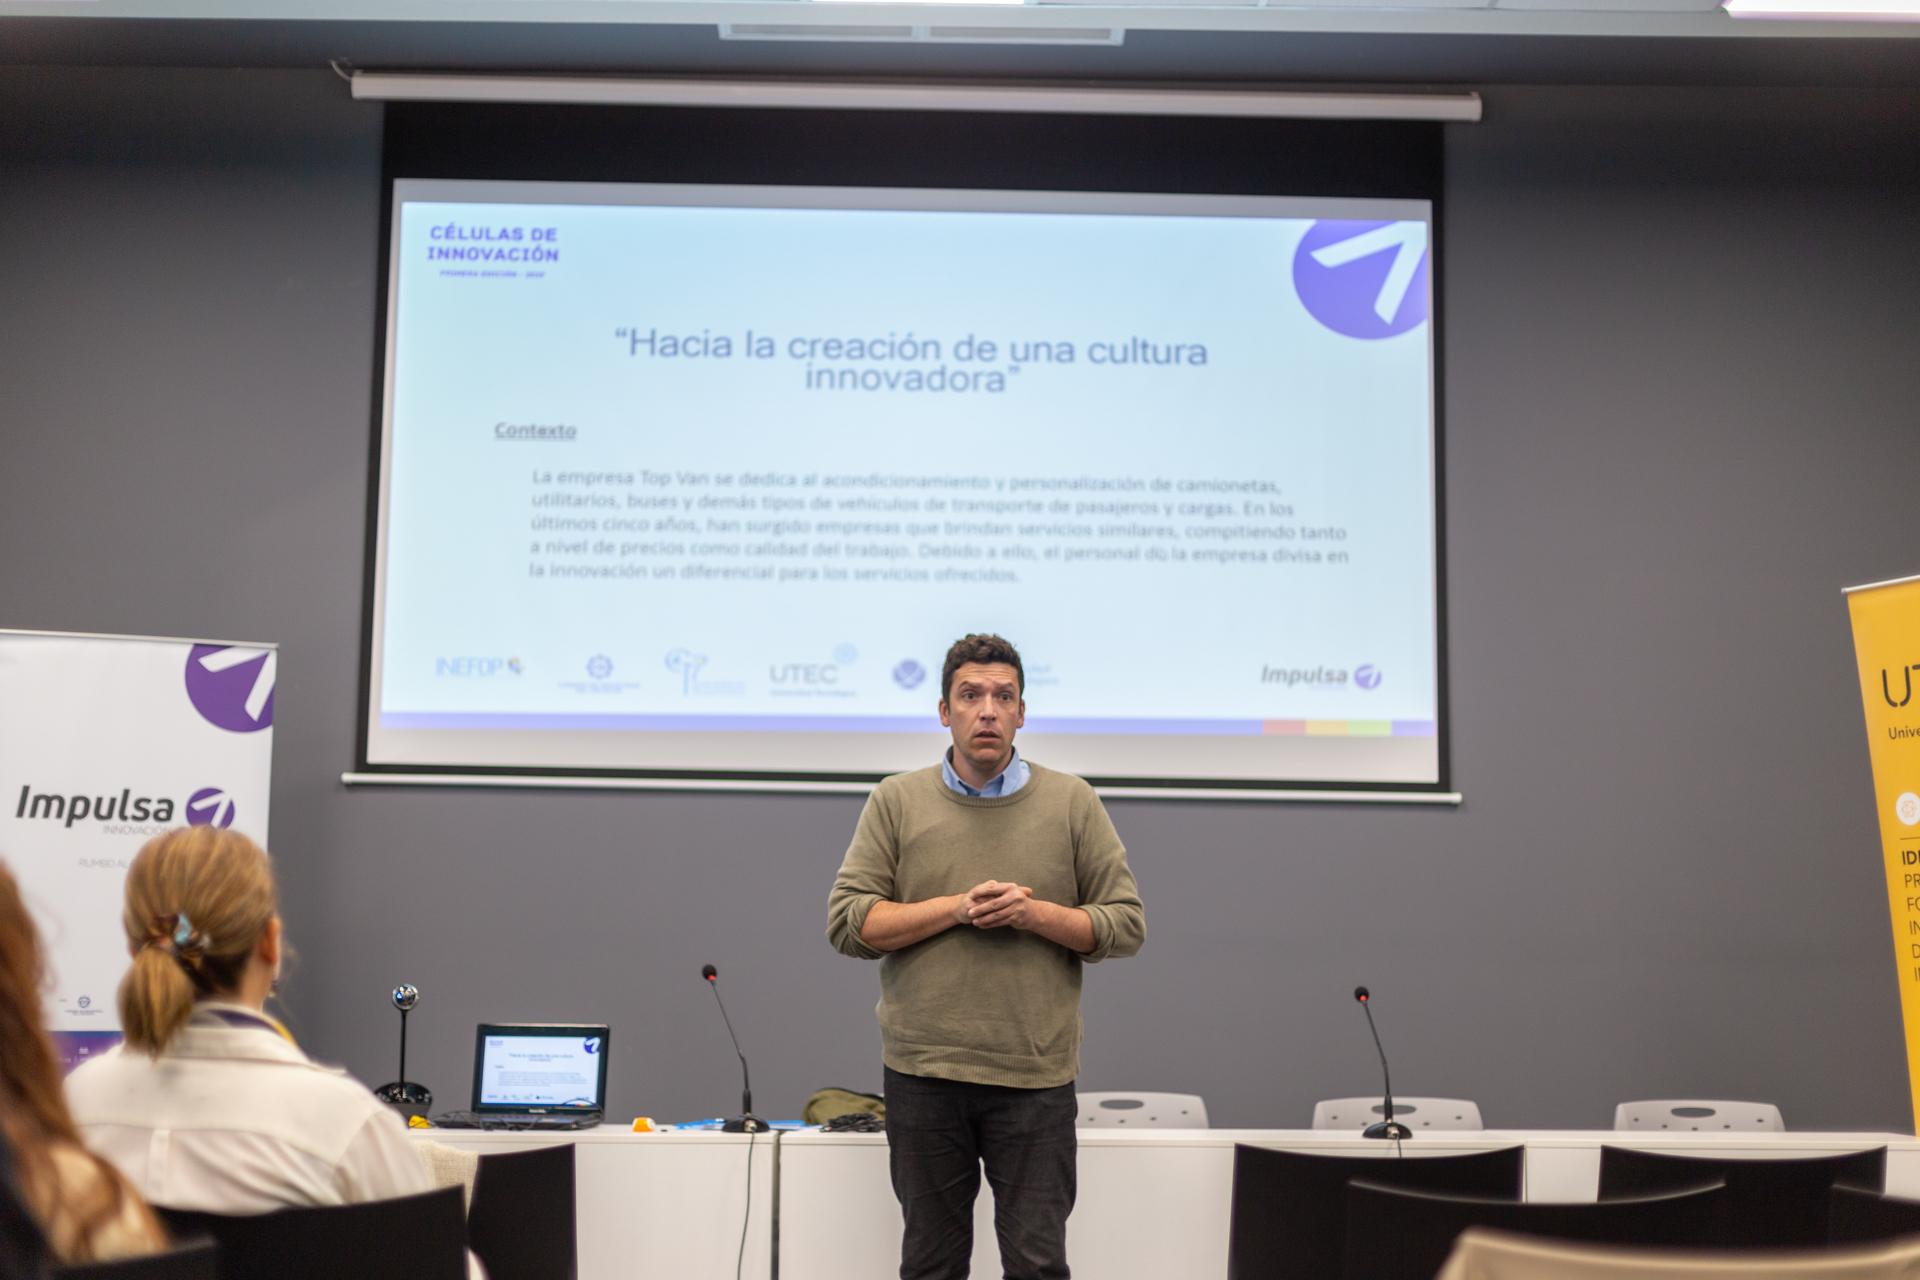 Lanzamiento Células de Innovación (Durazno) (01.10.19)